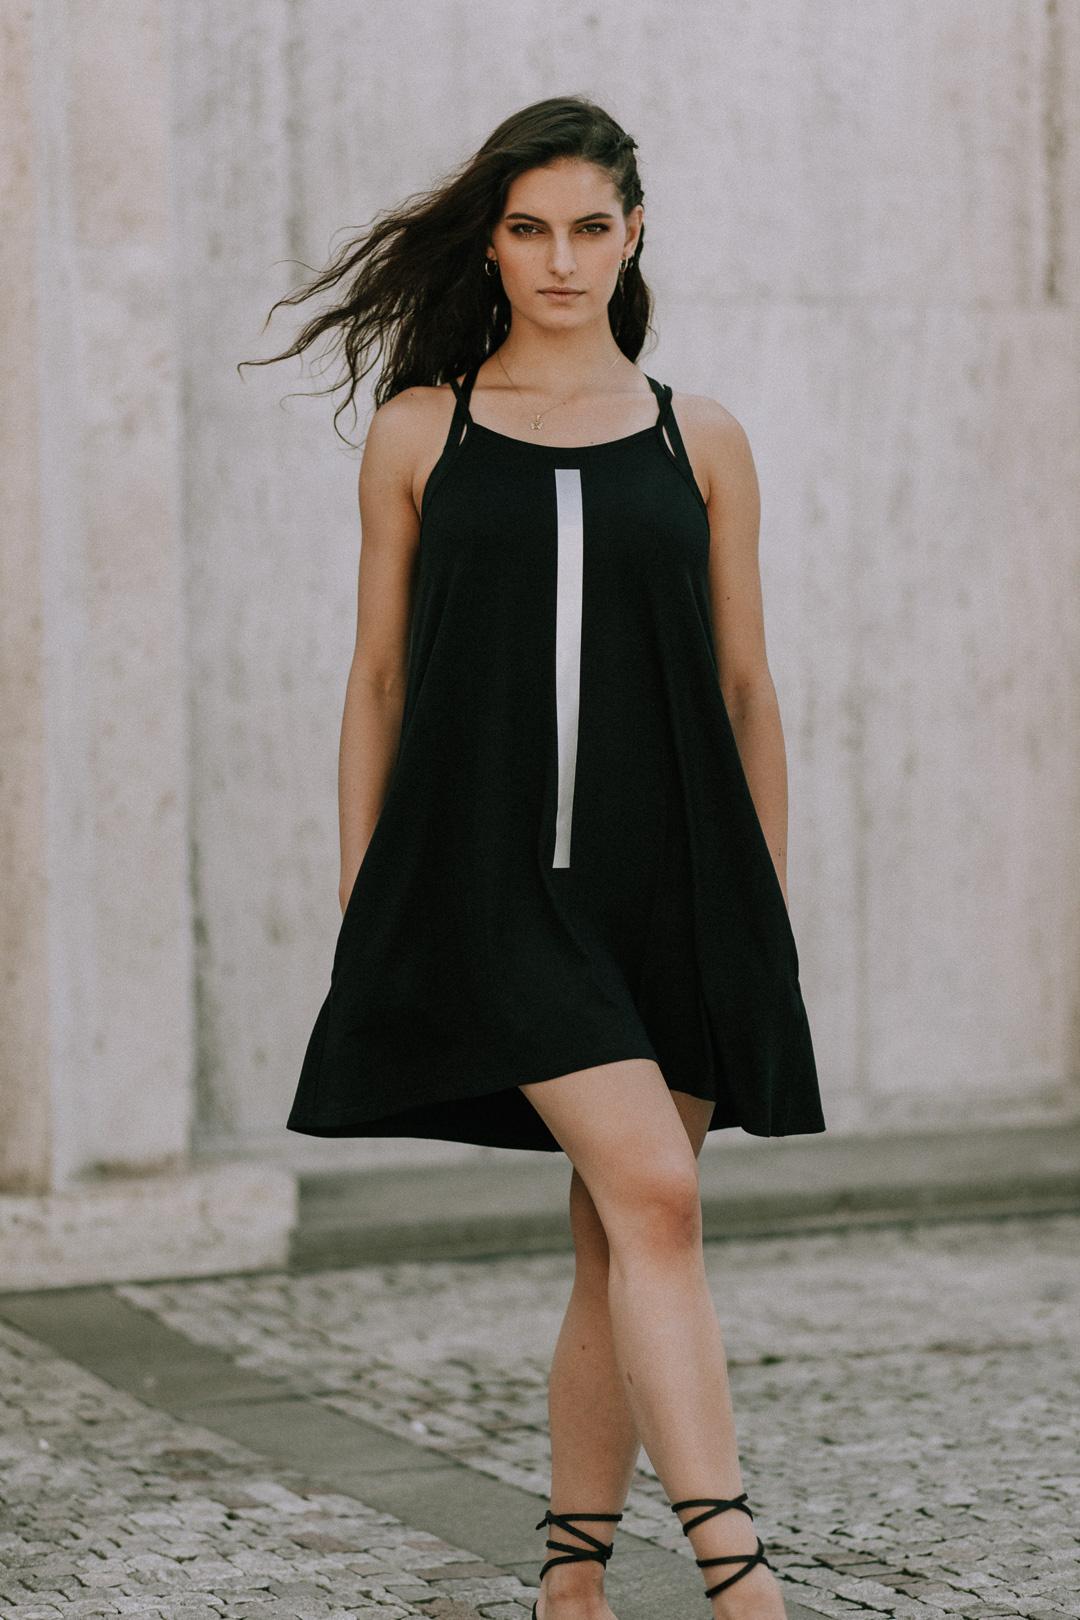 FNDLK úpletové šaty 405 AR